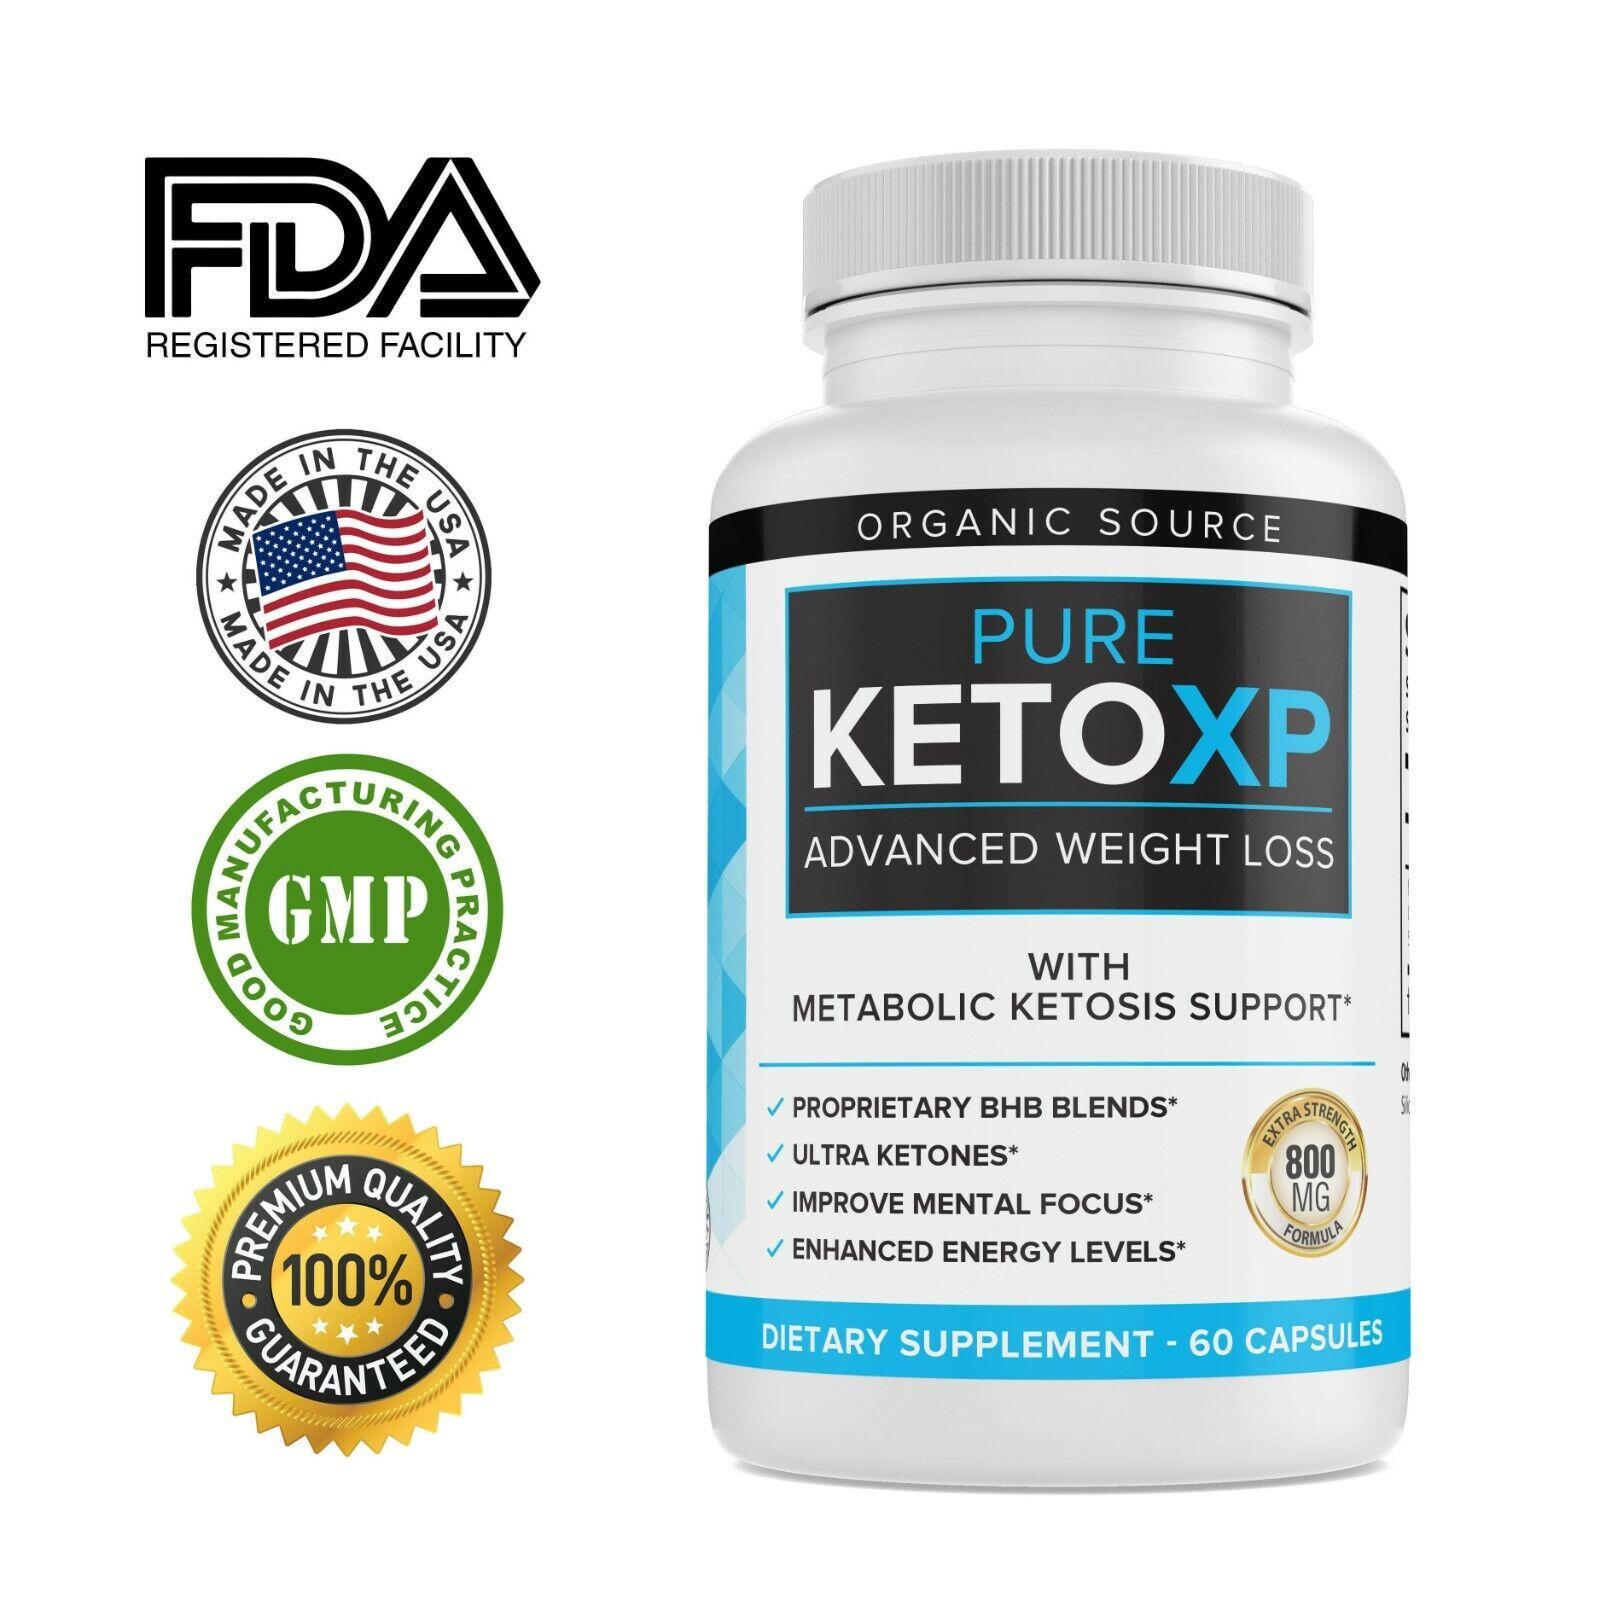 Ketoxp Xp Keto Pills Boost Weight Loss Diet Pills Best Keto XP BHB Supplement  1